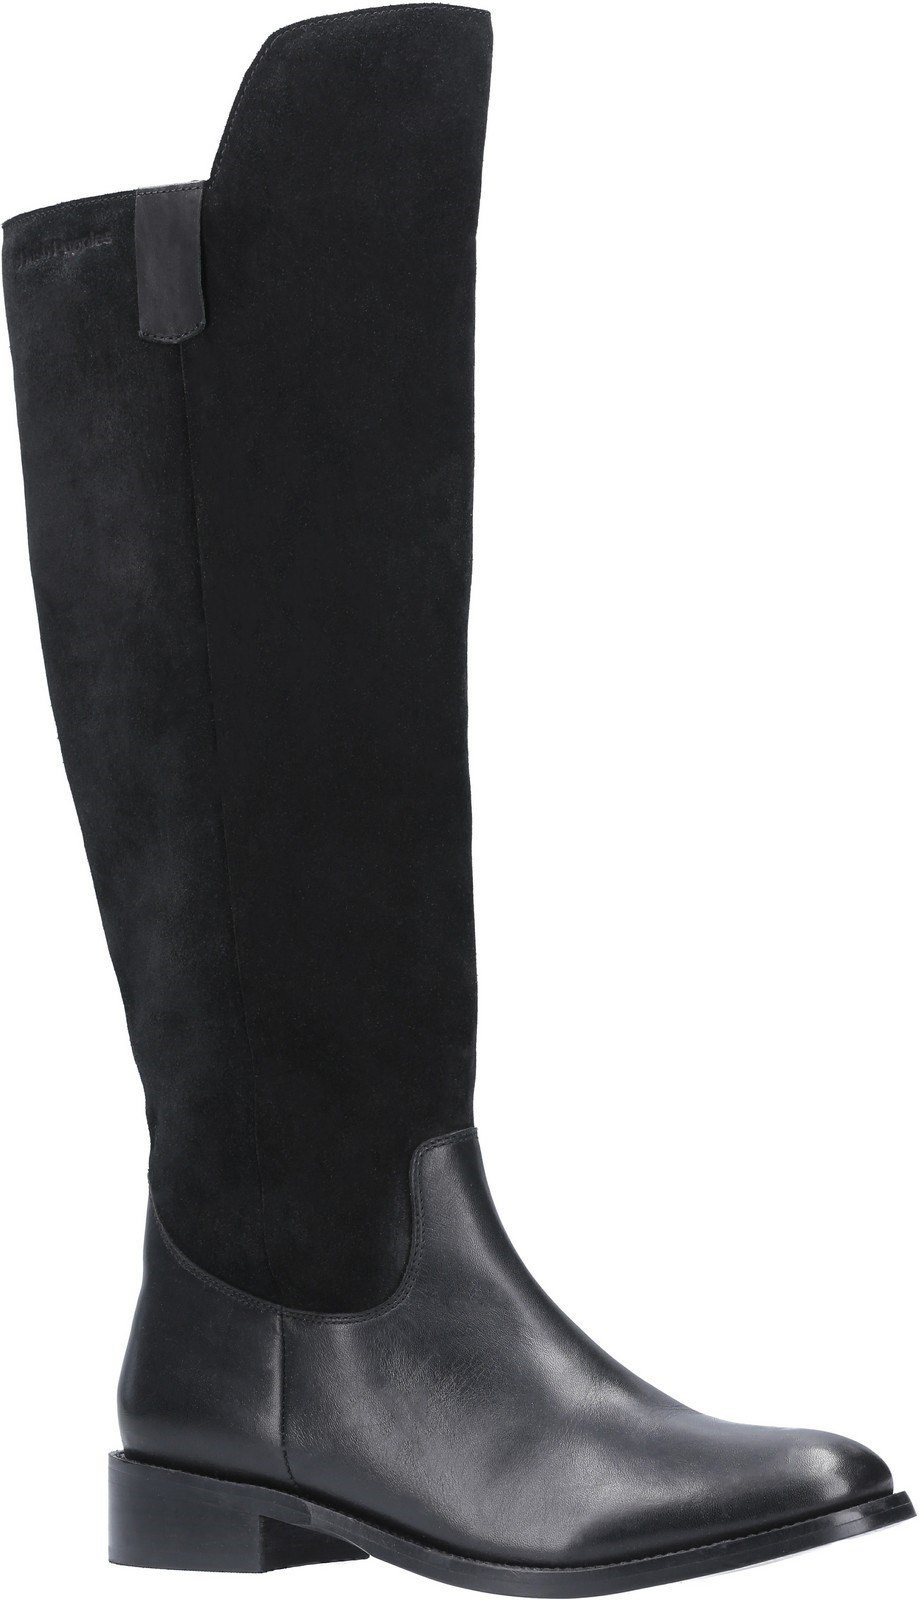 Hush Puppies Women's Alani Zip Up Long Boot Various Colours 29198 - Black 3